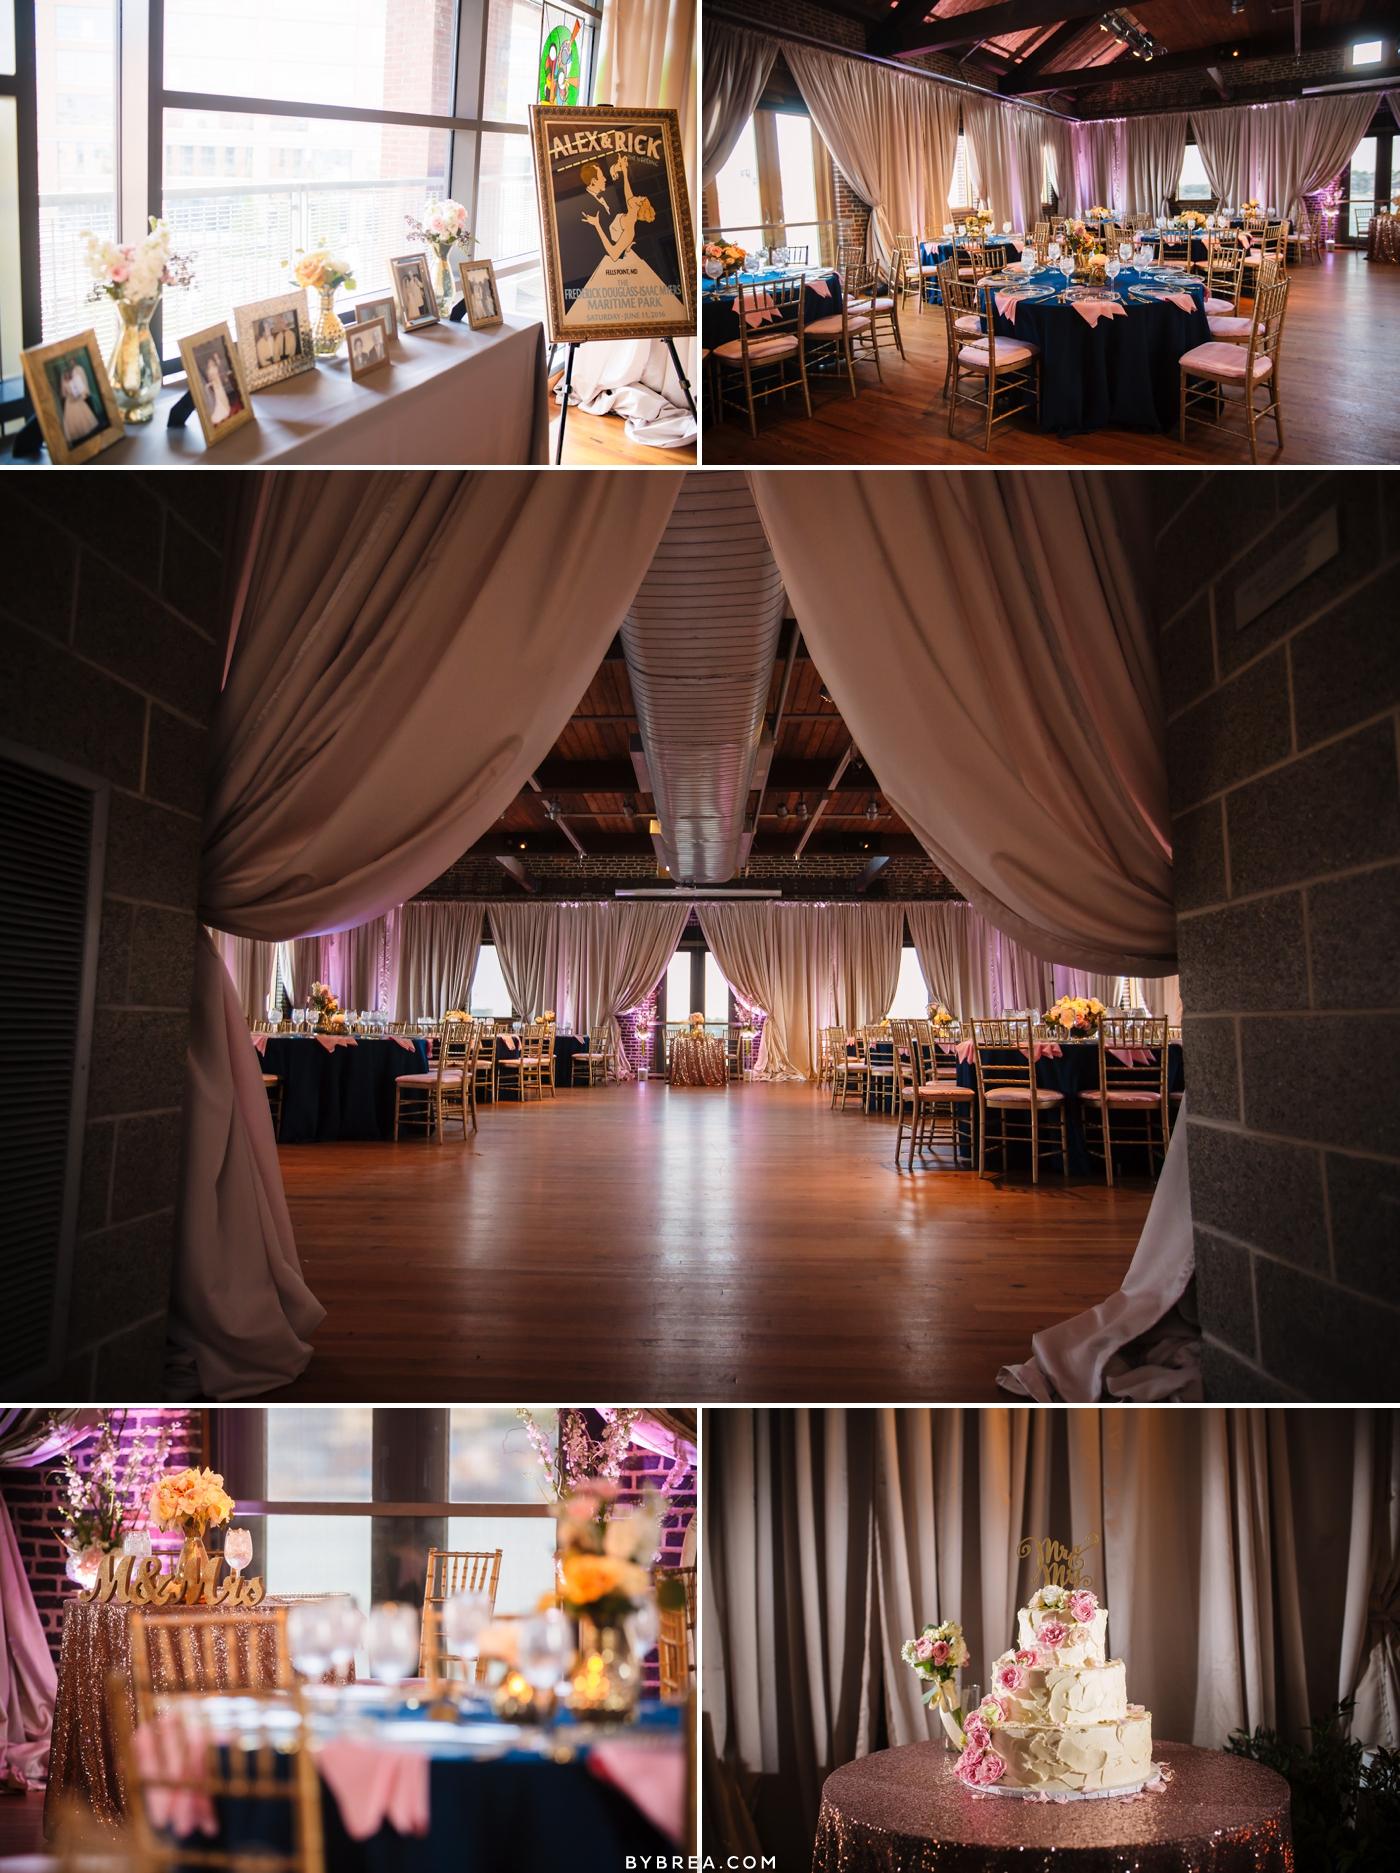 alex-rick-frederick-douglass-maritime-baltimore-wedding_0781